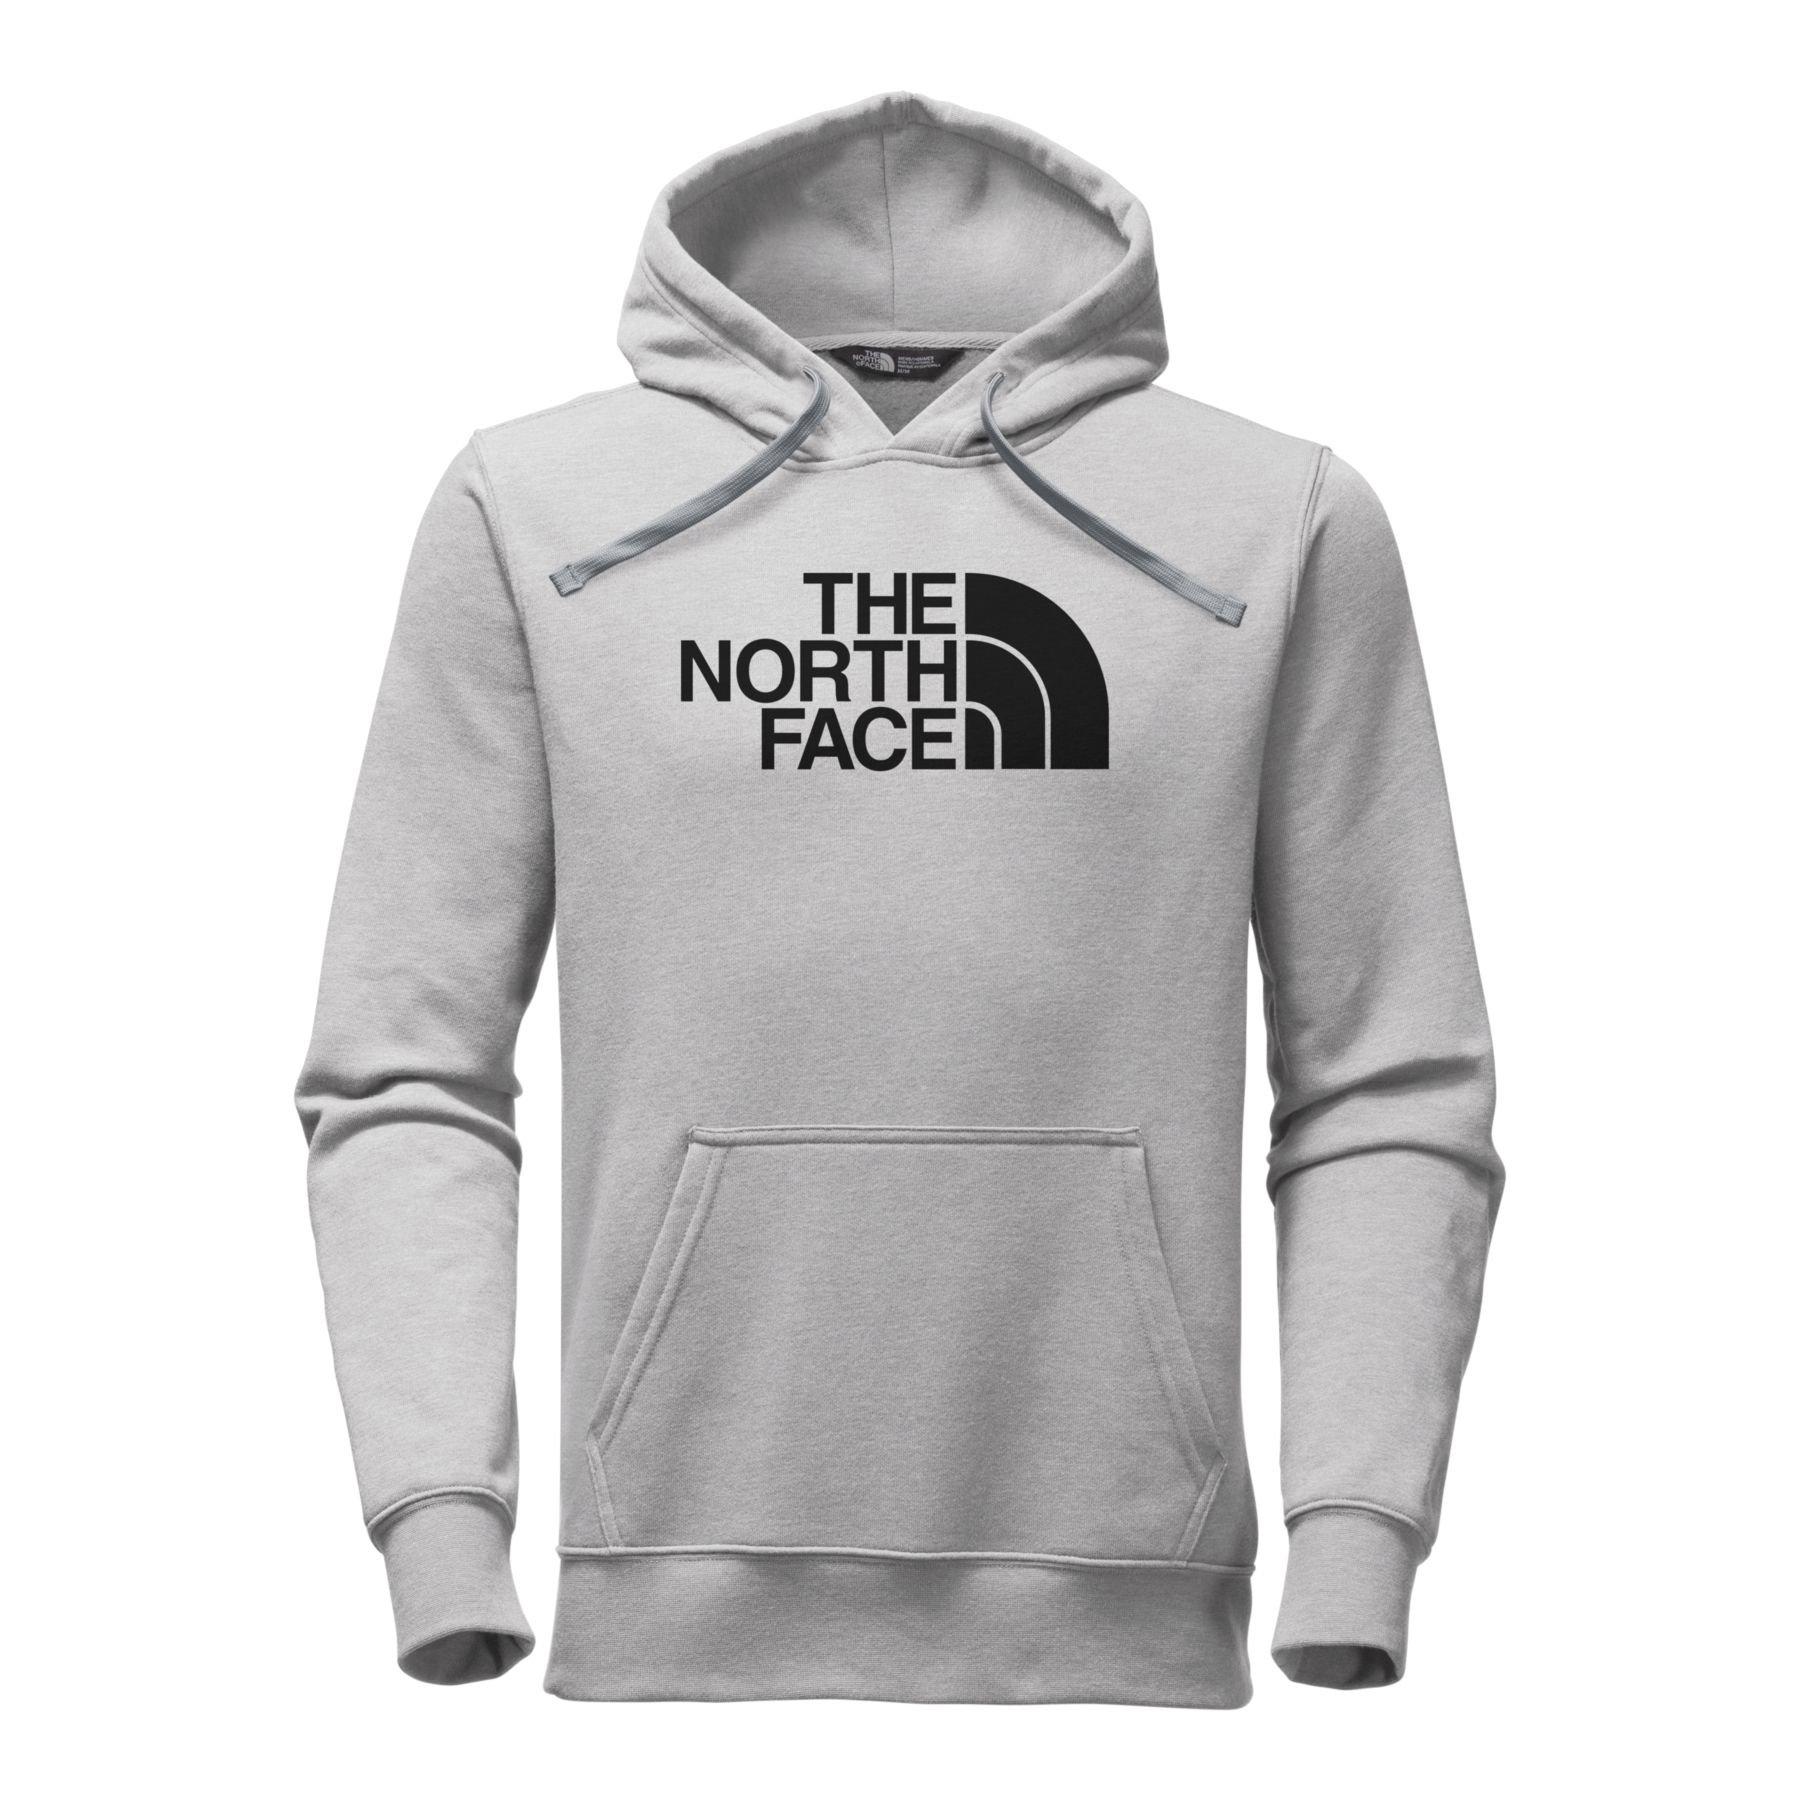 The North Face Men's Half Dome Hoodie - Medium Grey Heather/Black - L